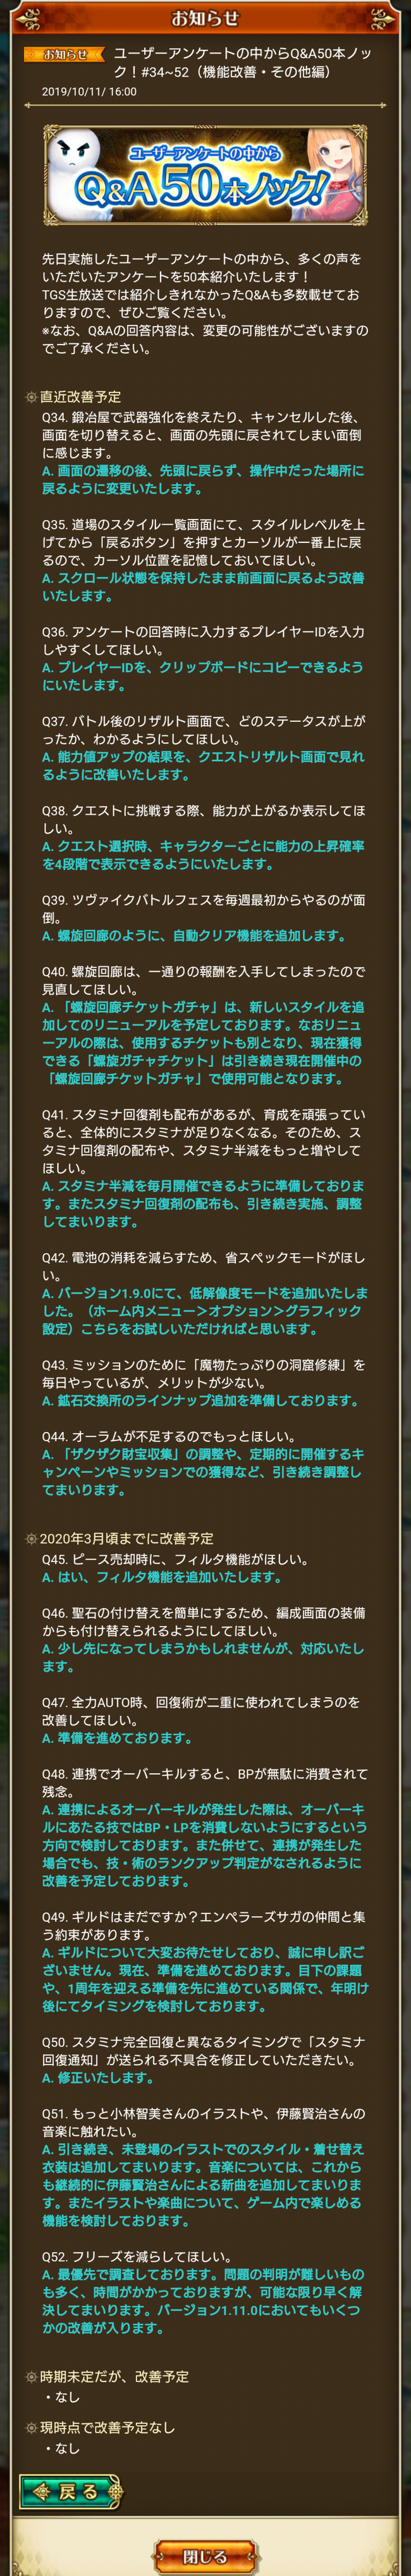 2019-10-11_17-47-49